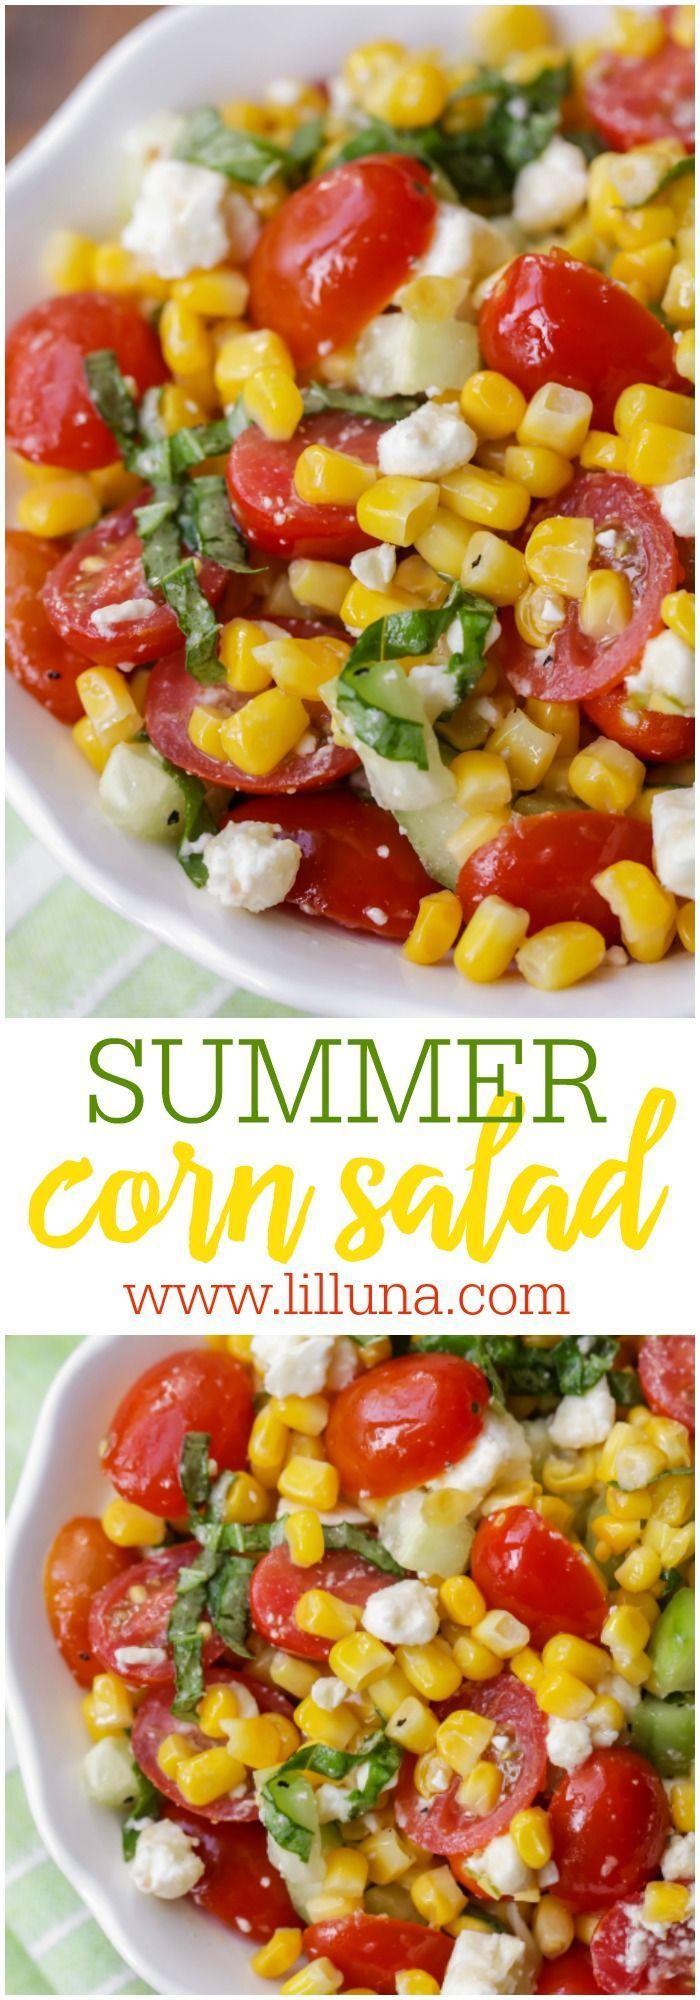 Corn Salad Recipe - Perfect for Summer! (+VIDEO) |